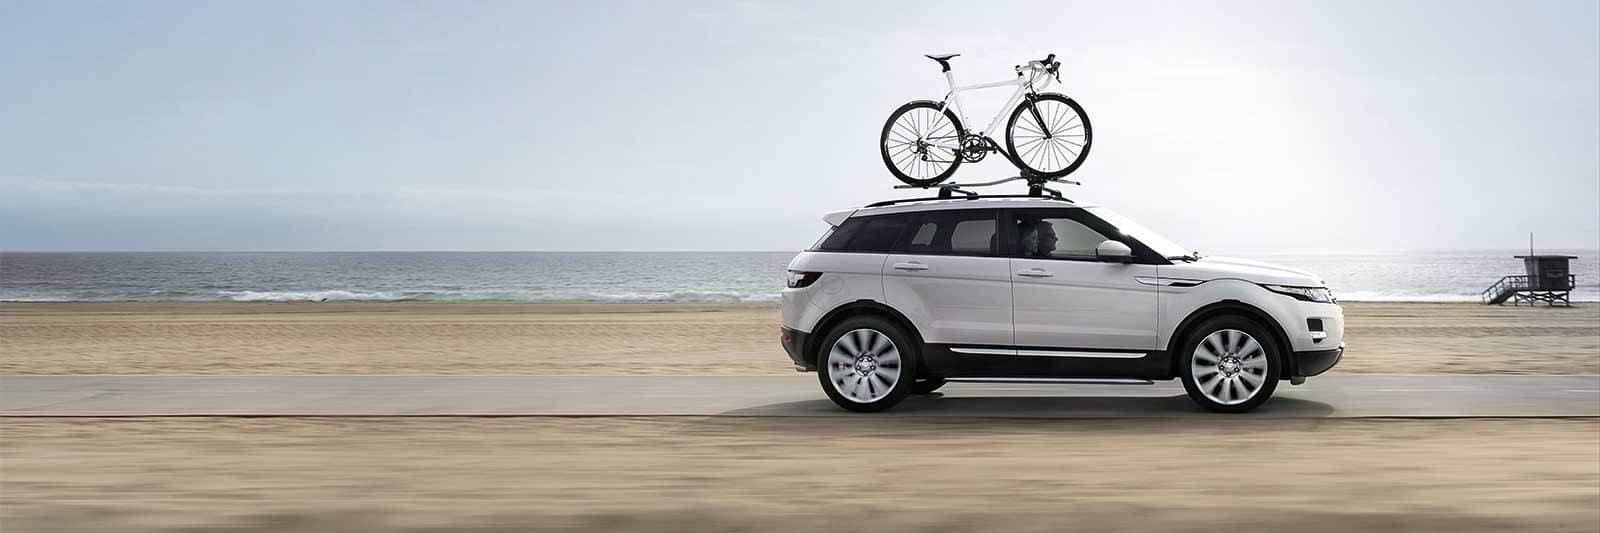 Vehicle Accessories EStore Land Rover West Ashley - Estore acura